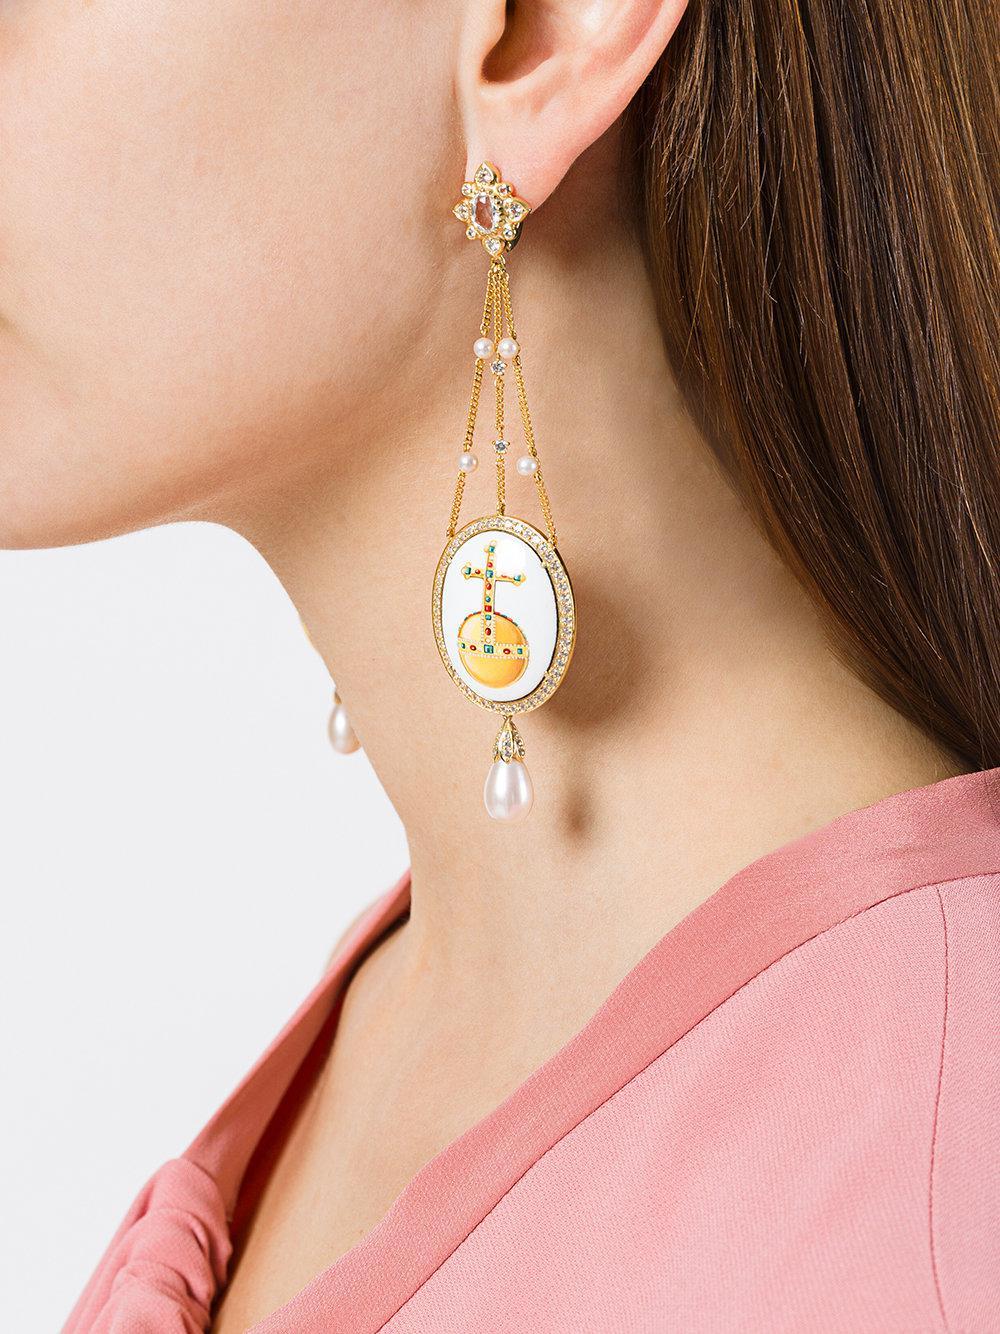 Axenoff Jewellery crown & sovereigns orb drop earrings - Metallic wuZBFN